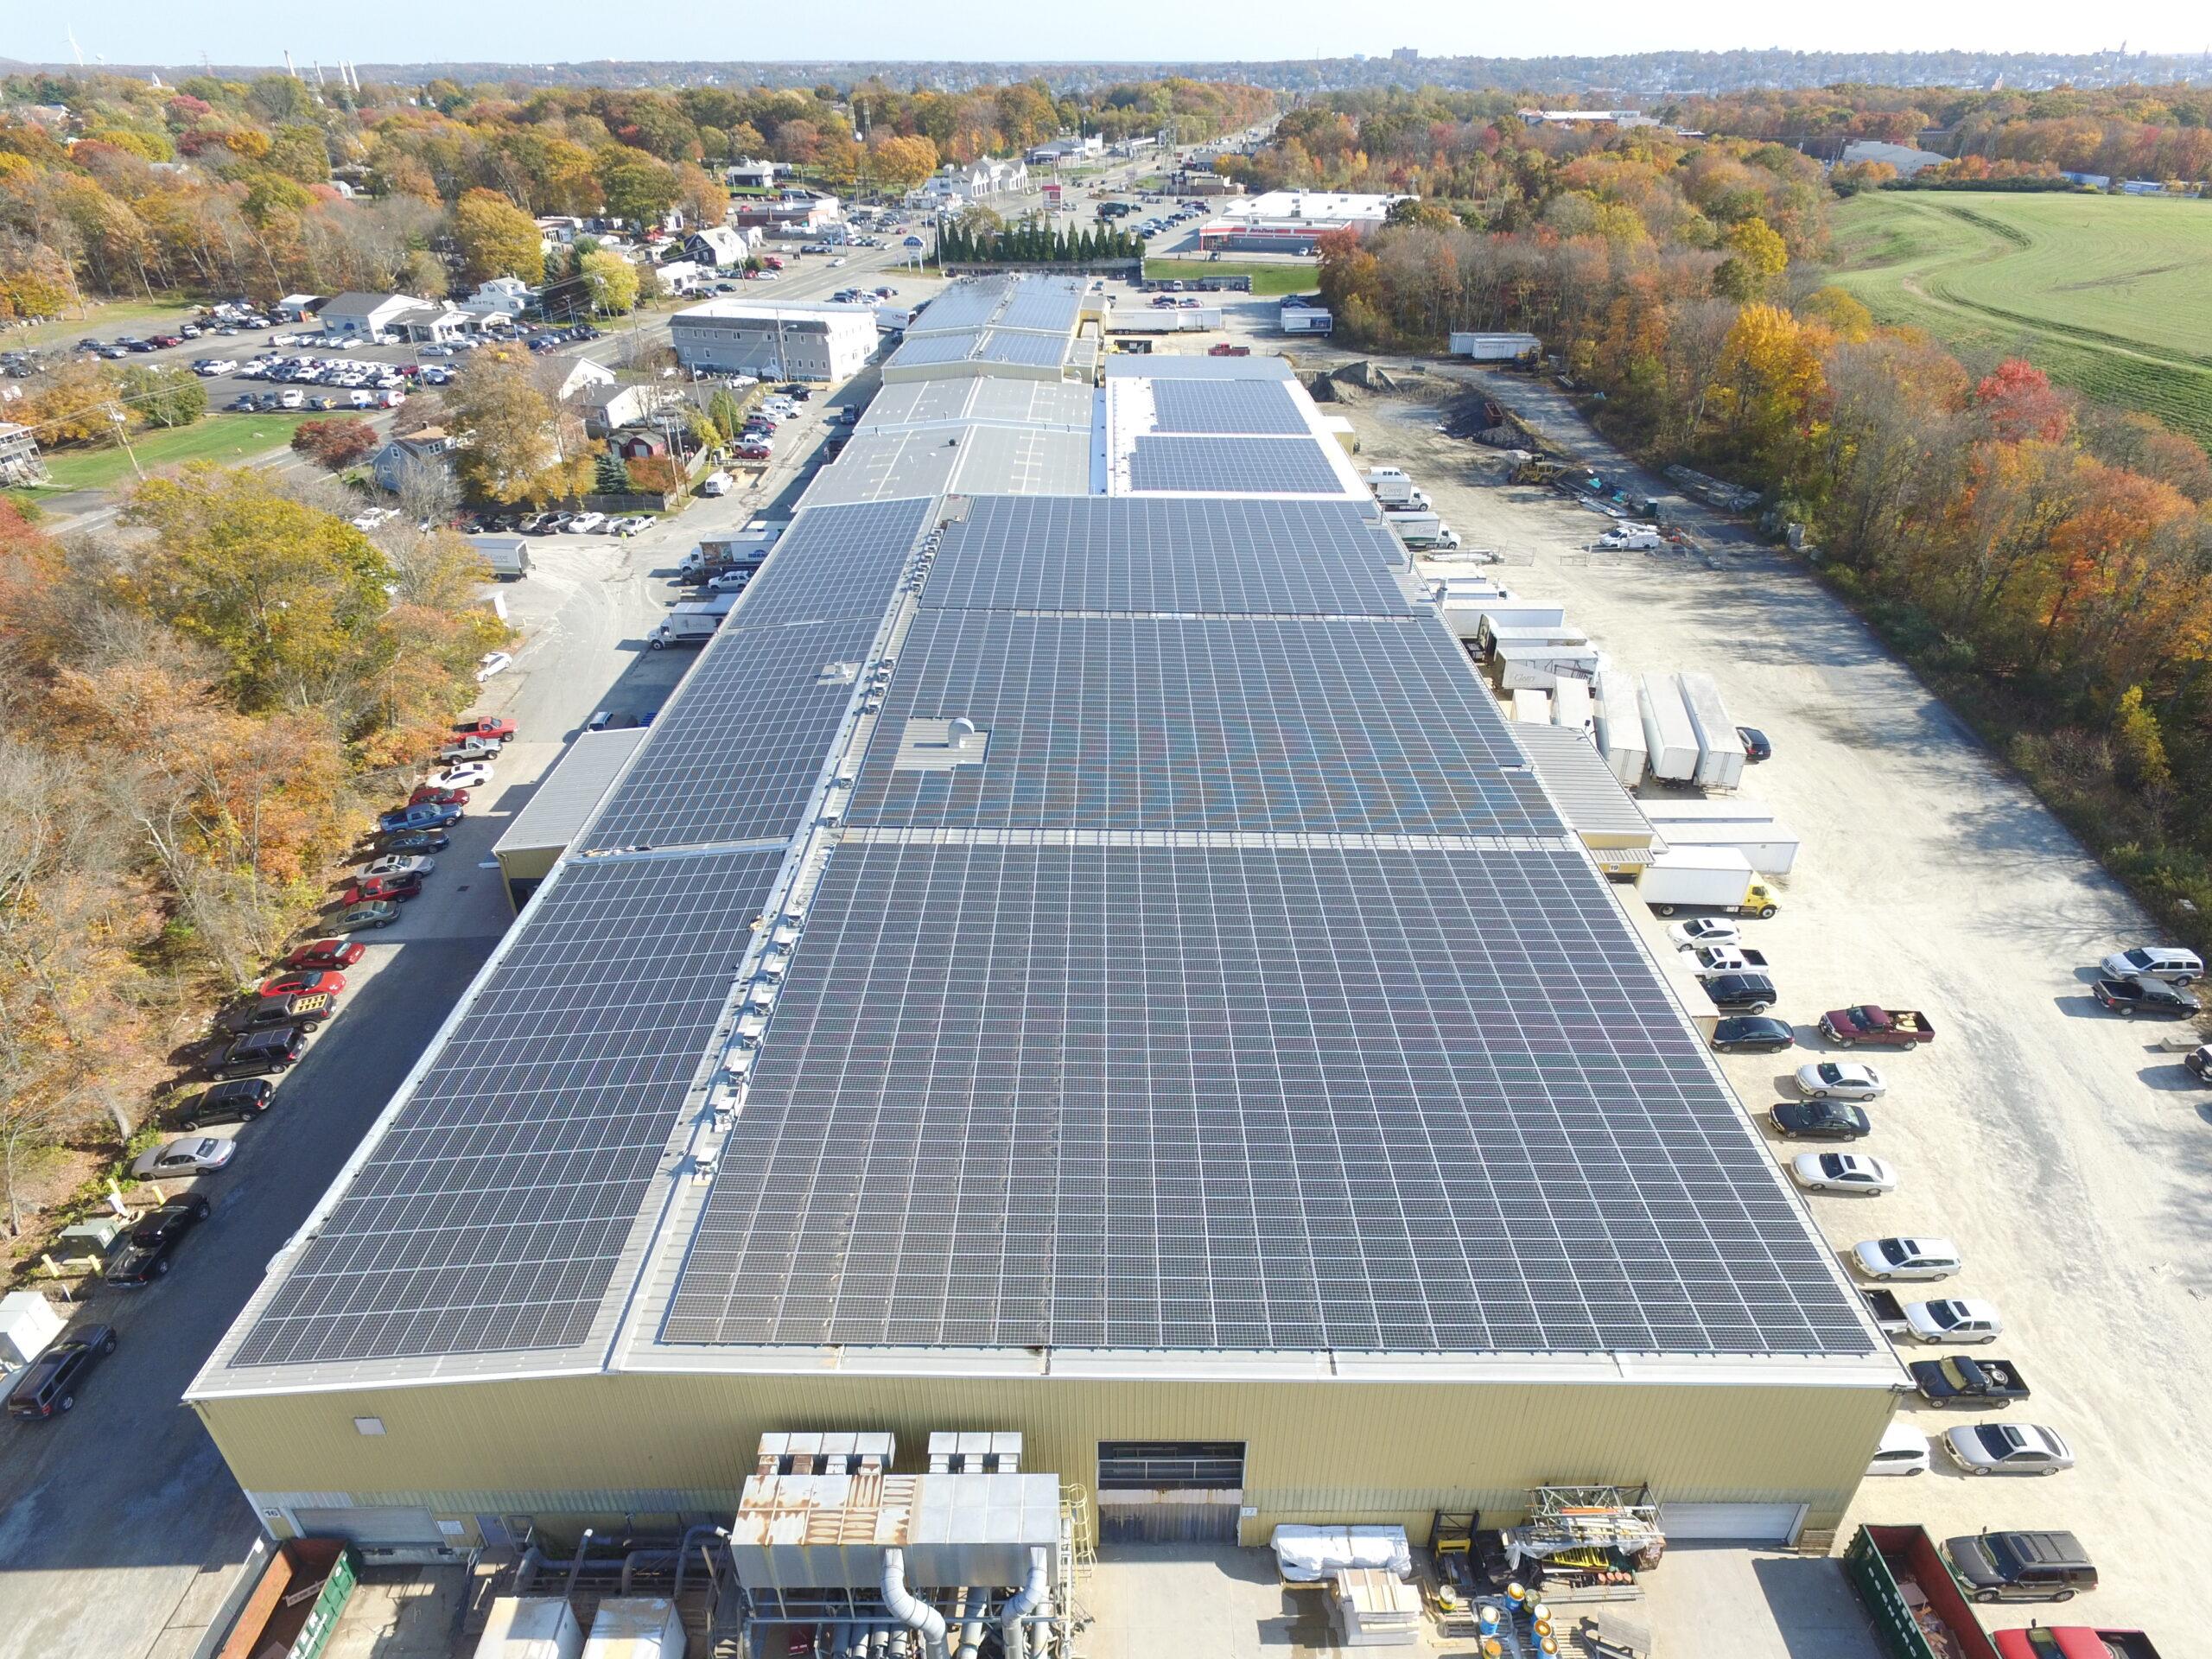 Solar panels on NAC facility photo